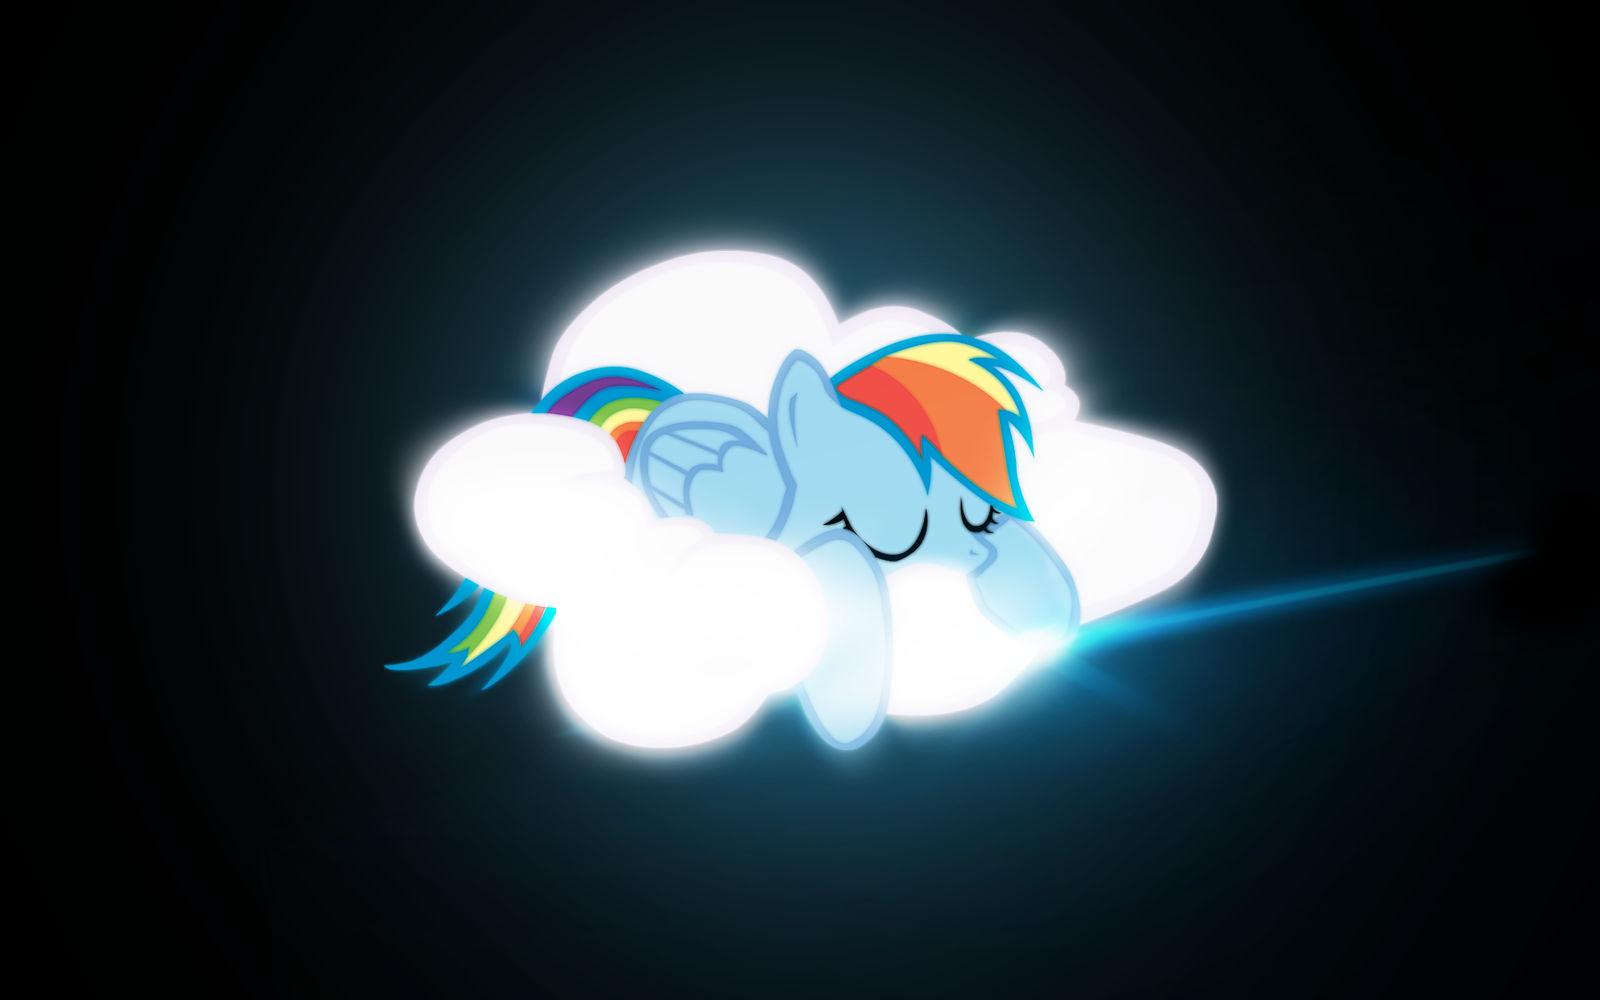 RD sleeping on a cloud - [ Wallpaper ] by sHAAkurAs